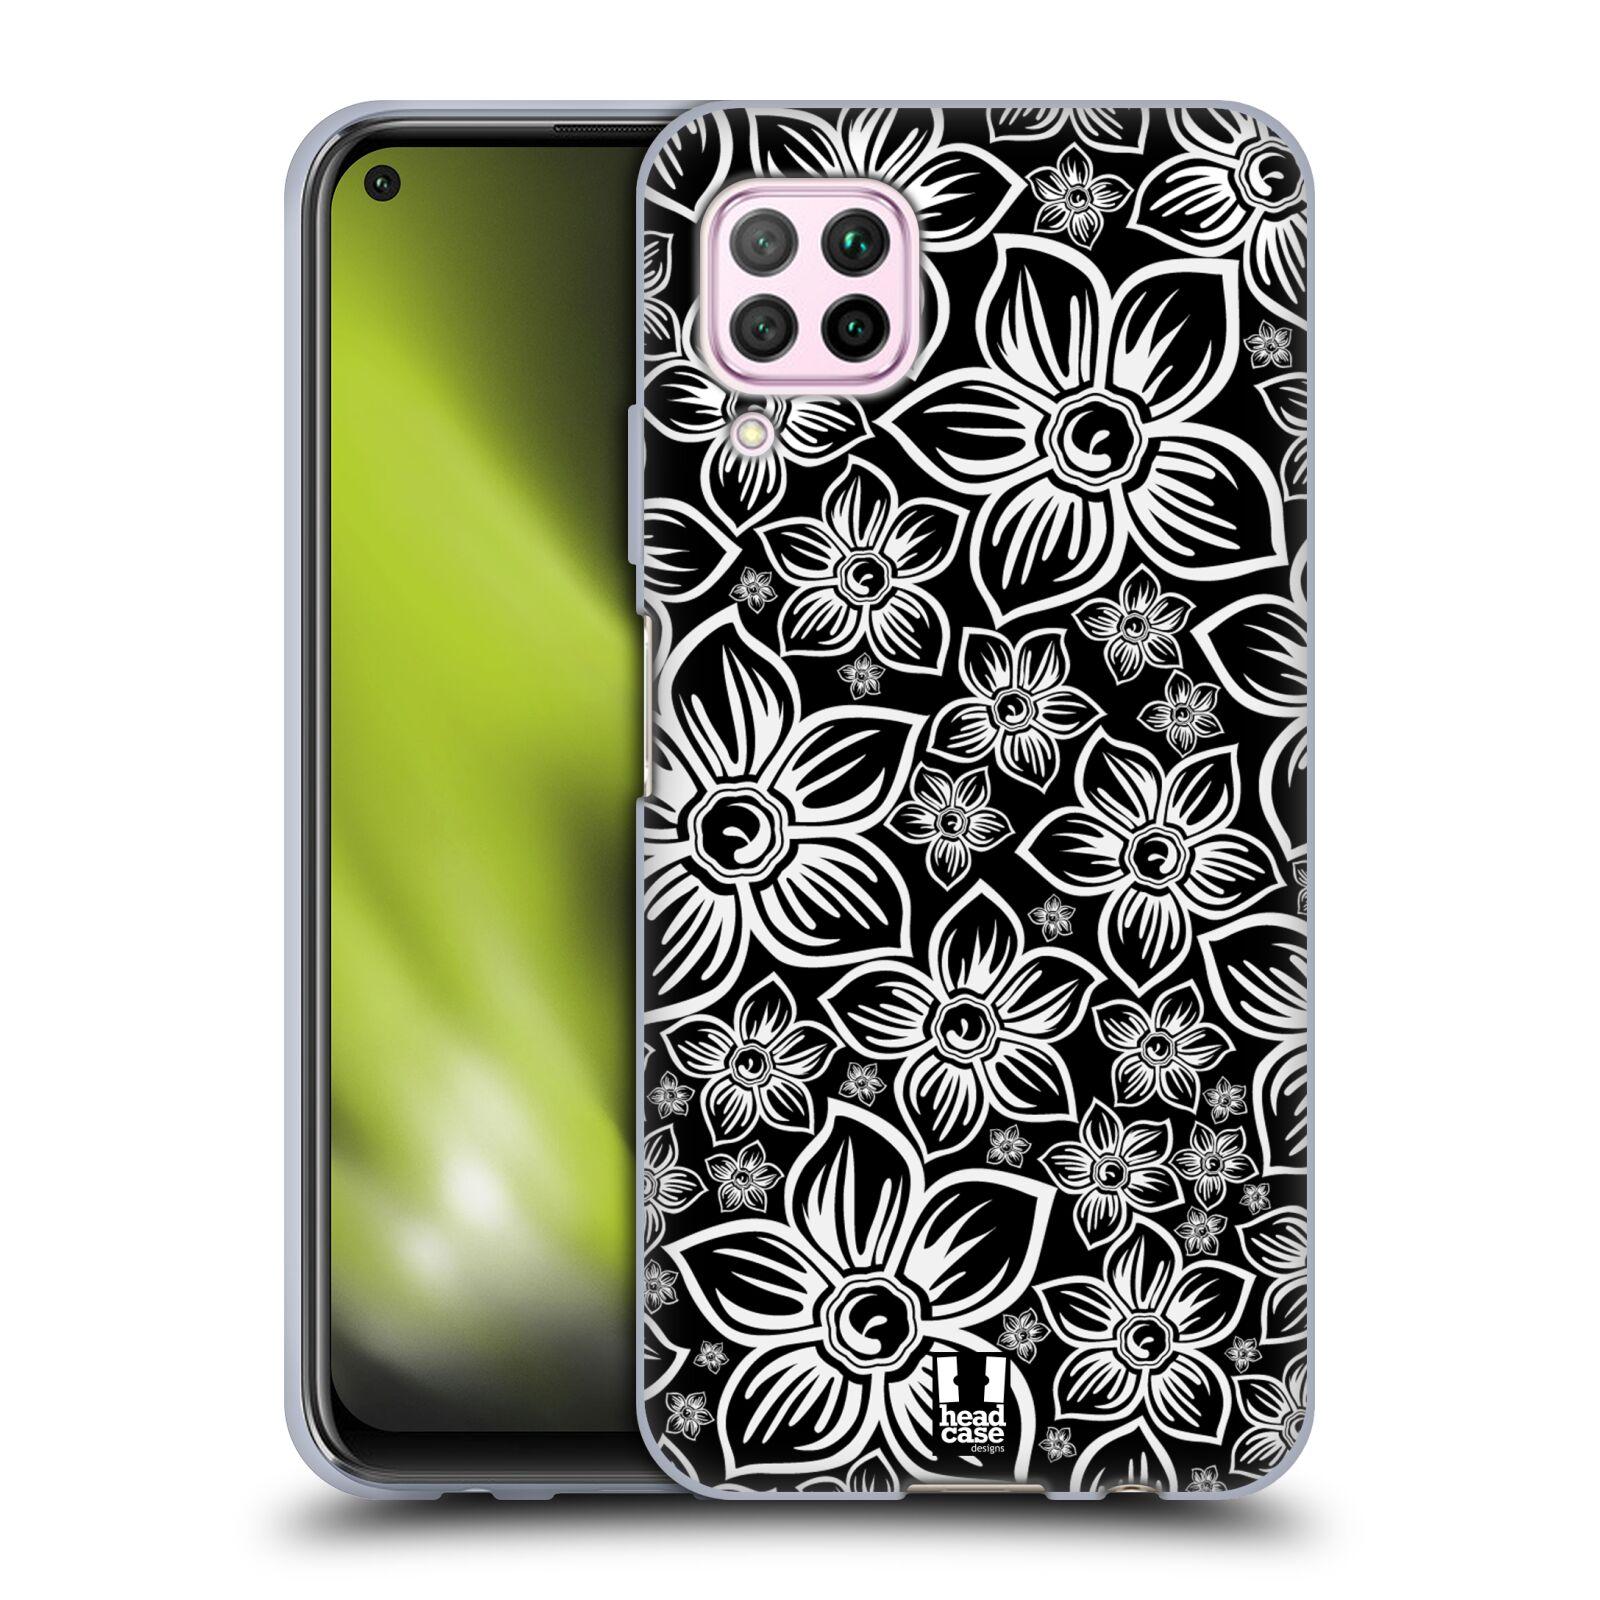 Silikonové pouzdro na mobil Huawei P40 Lite - Head Case - FLORAL DAISY